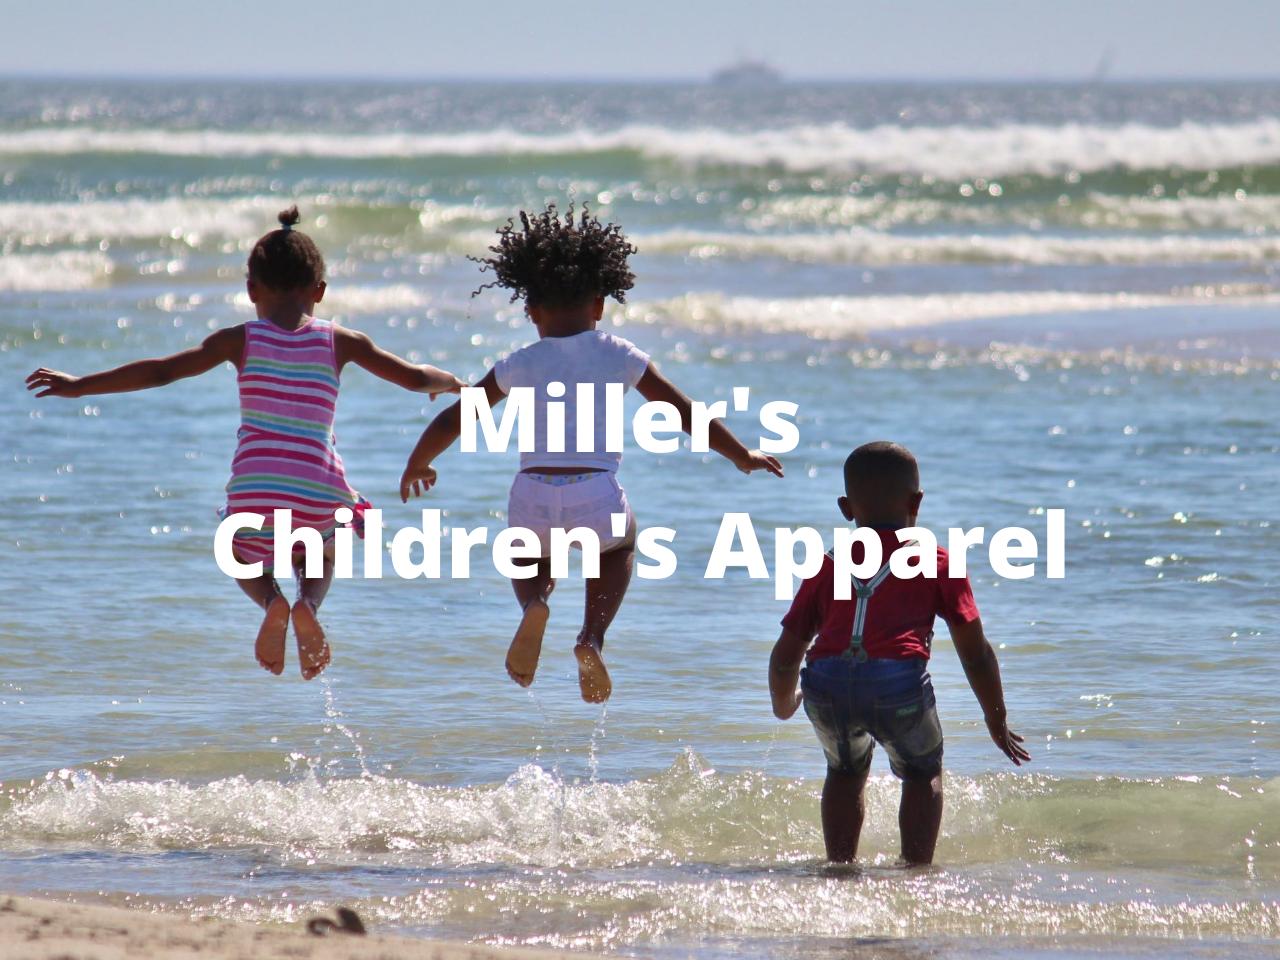 Miller's Children's Apparel